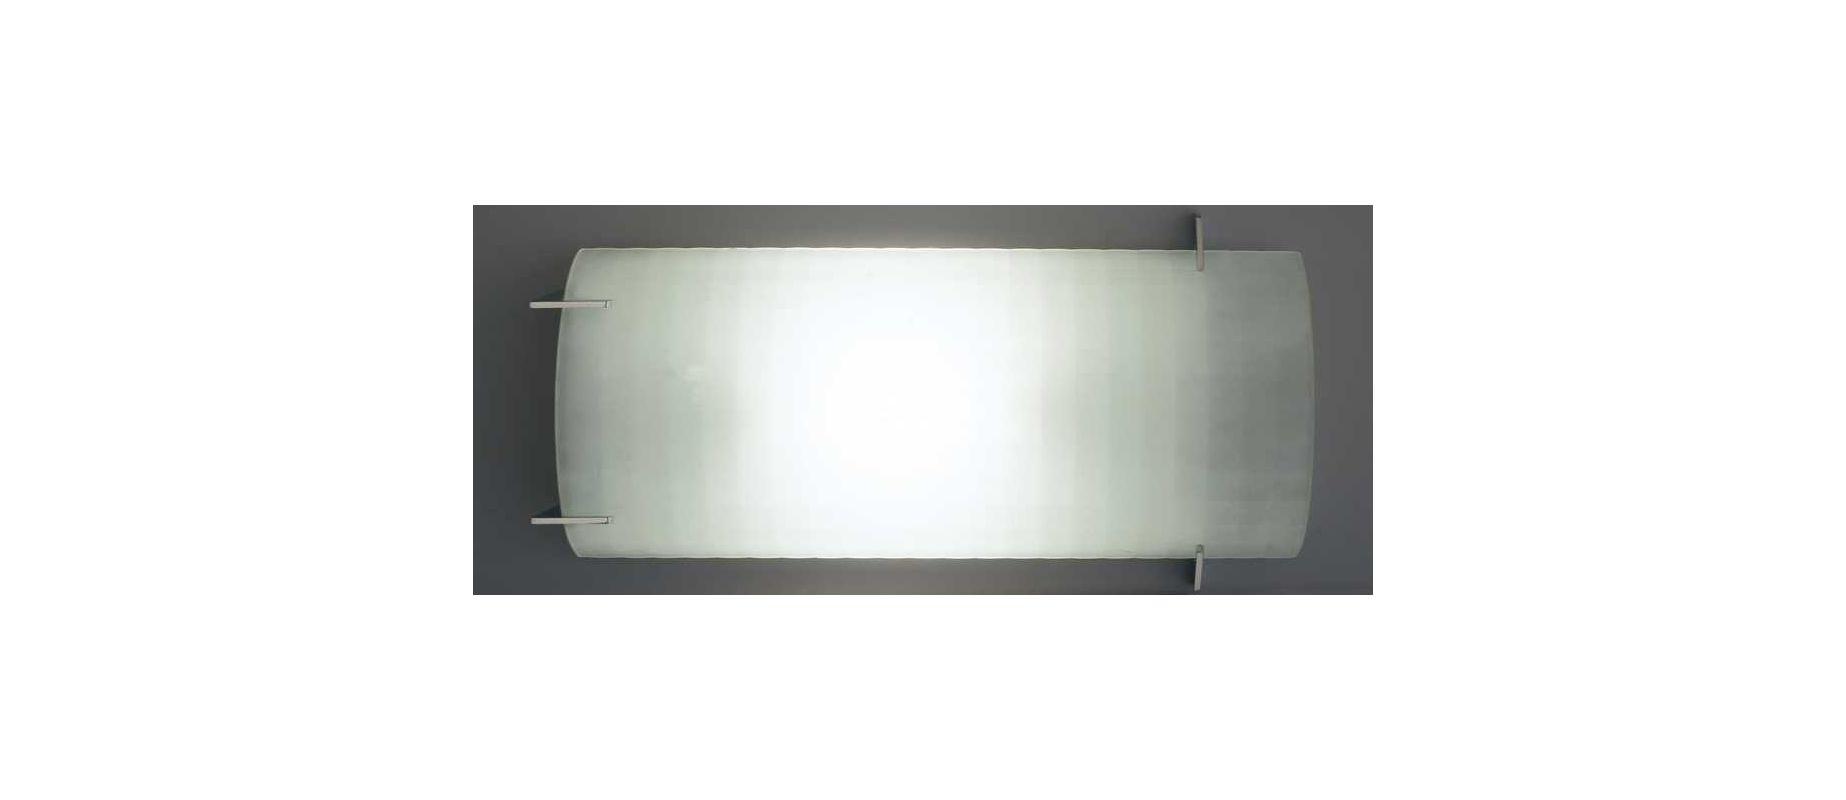 PLC Lighting 12106 PC Polished Chrome Contemporary Contempo Wall Light